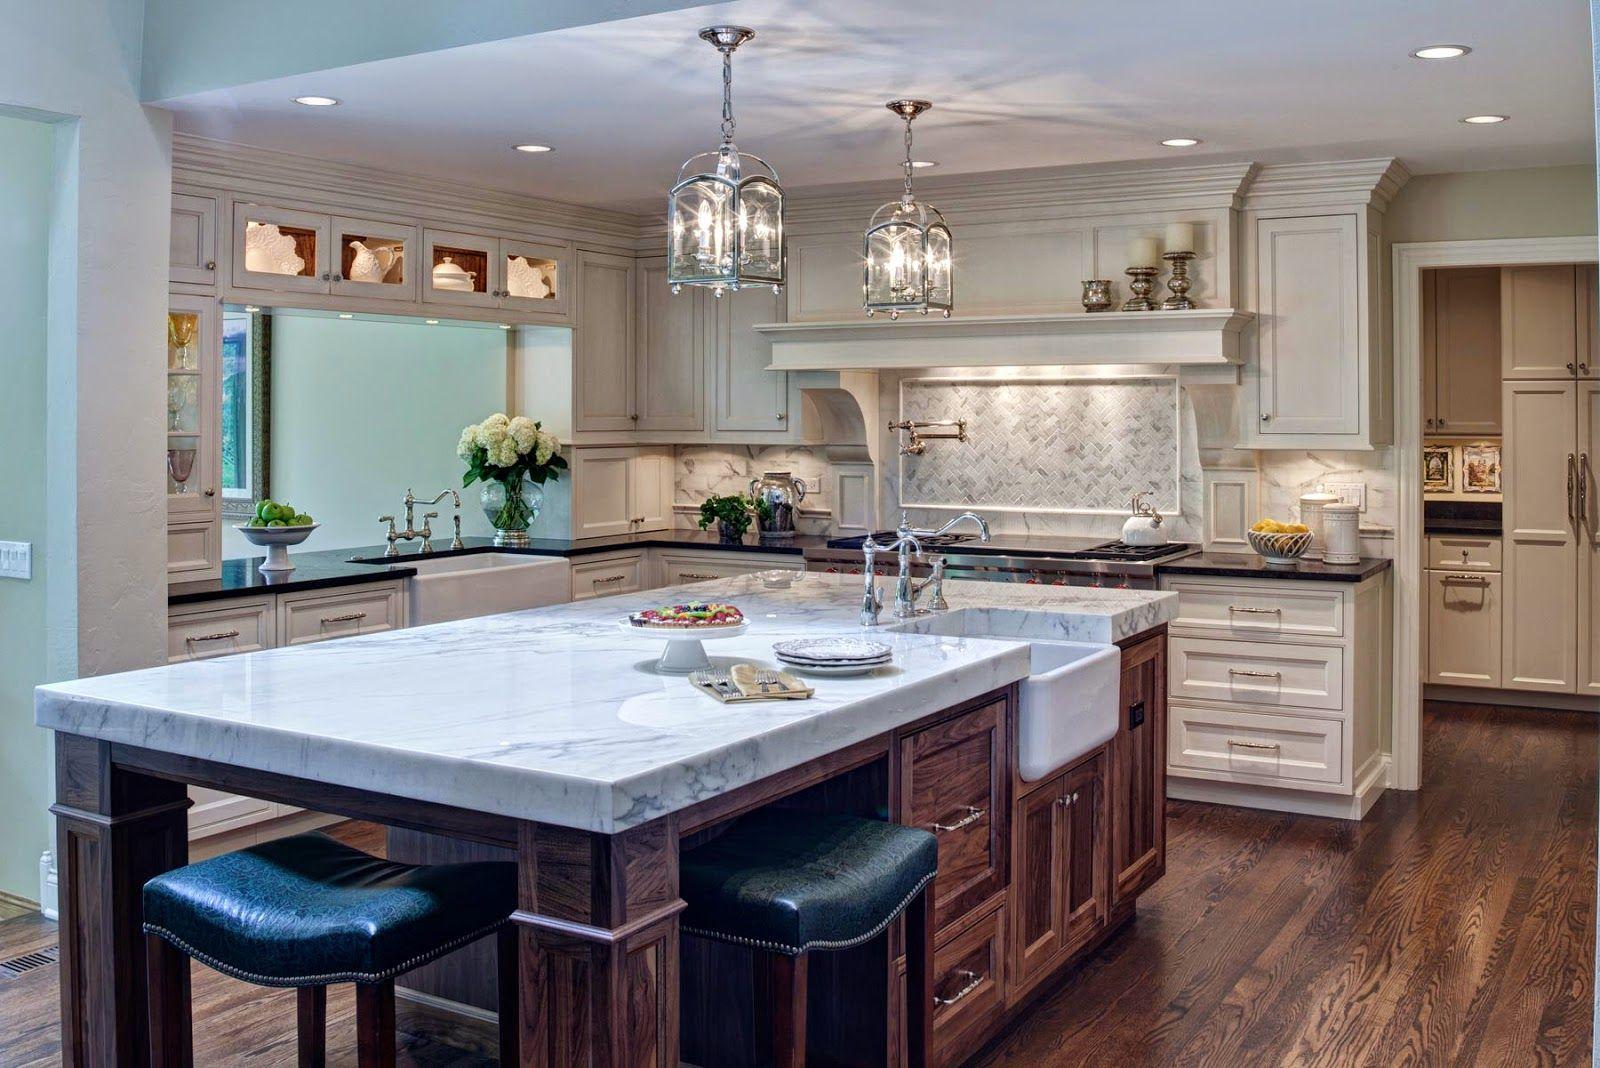 Kitchen Designers Chicago Pleasing 2 Style Estate  Copper  Pinterest  Kitchen Styling Kitchen Decorating Inspiration